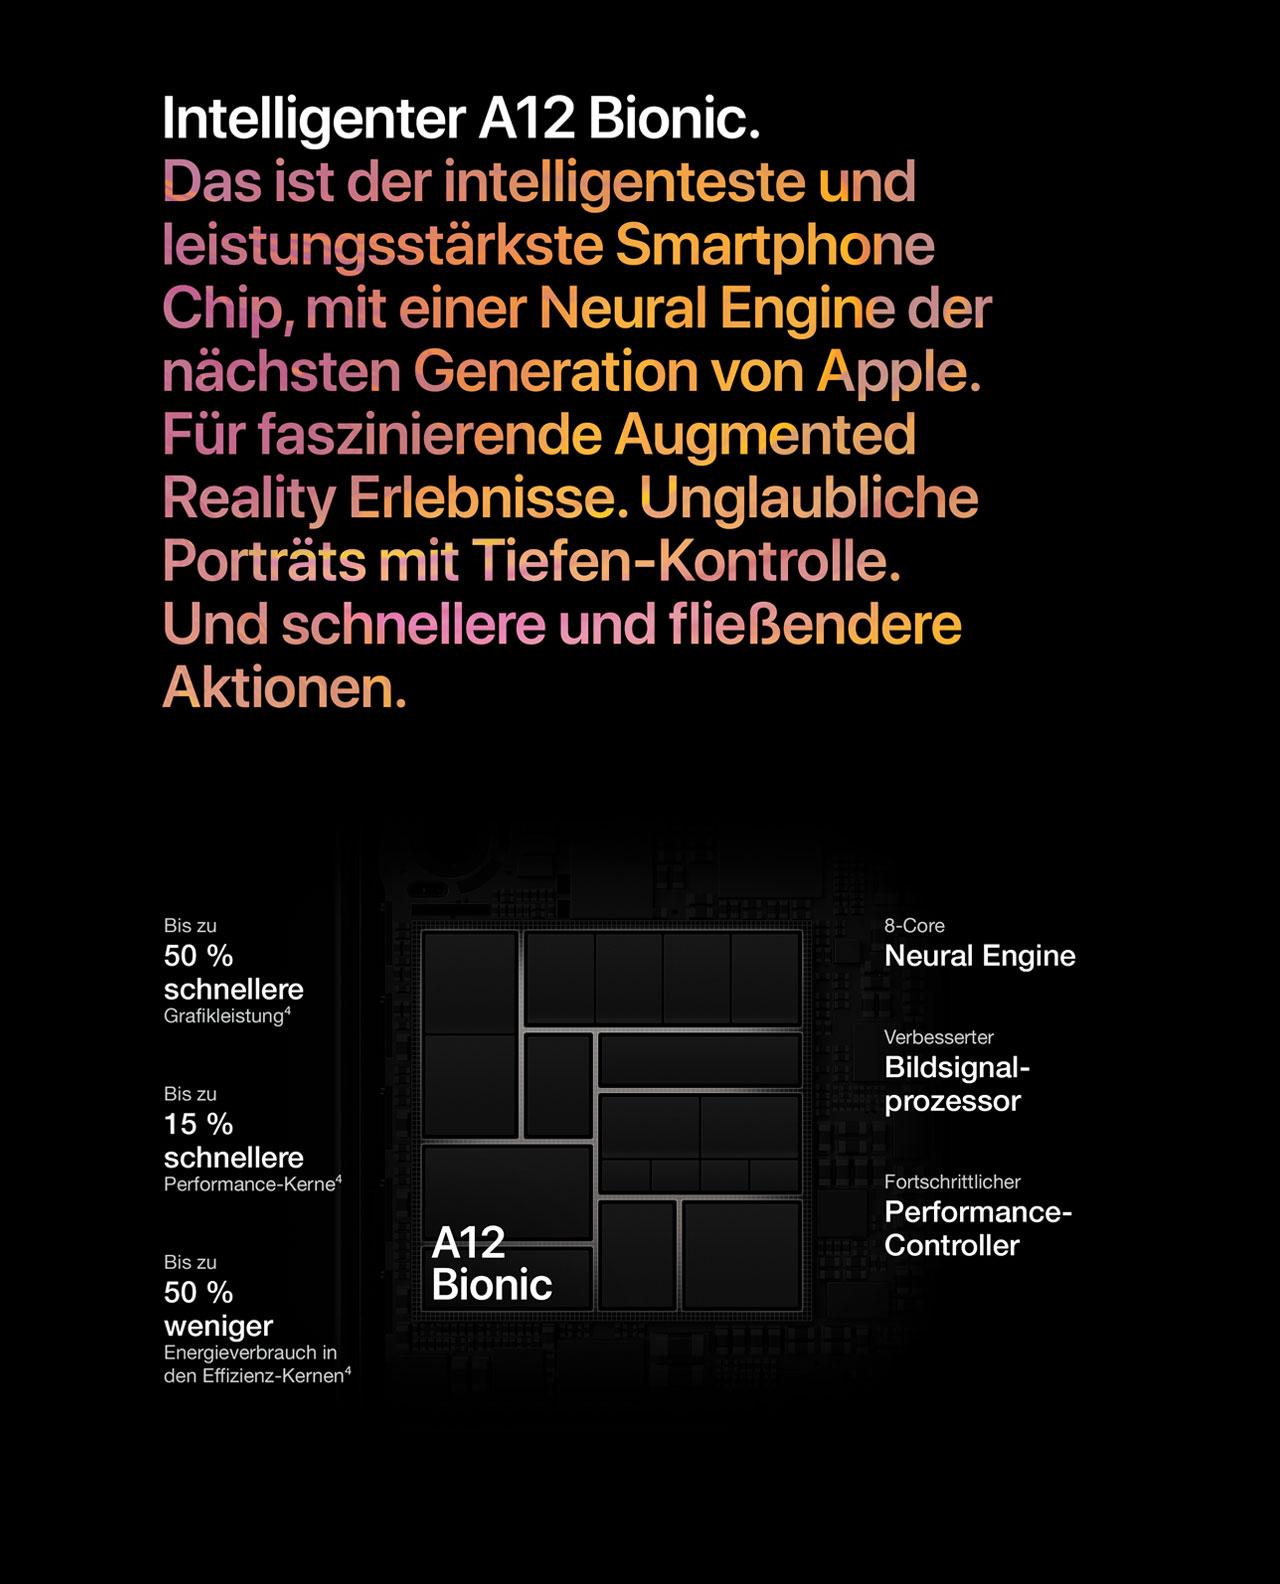 Intelligenter A12 Bionic